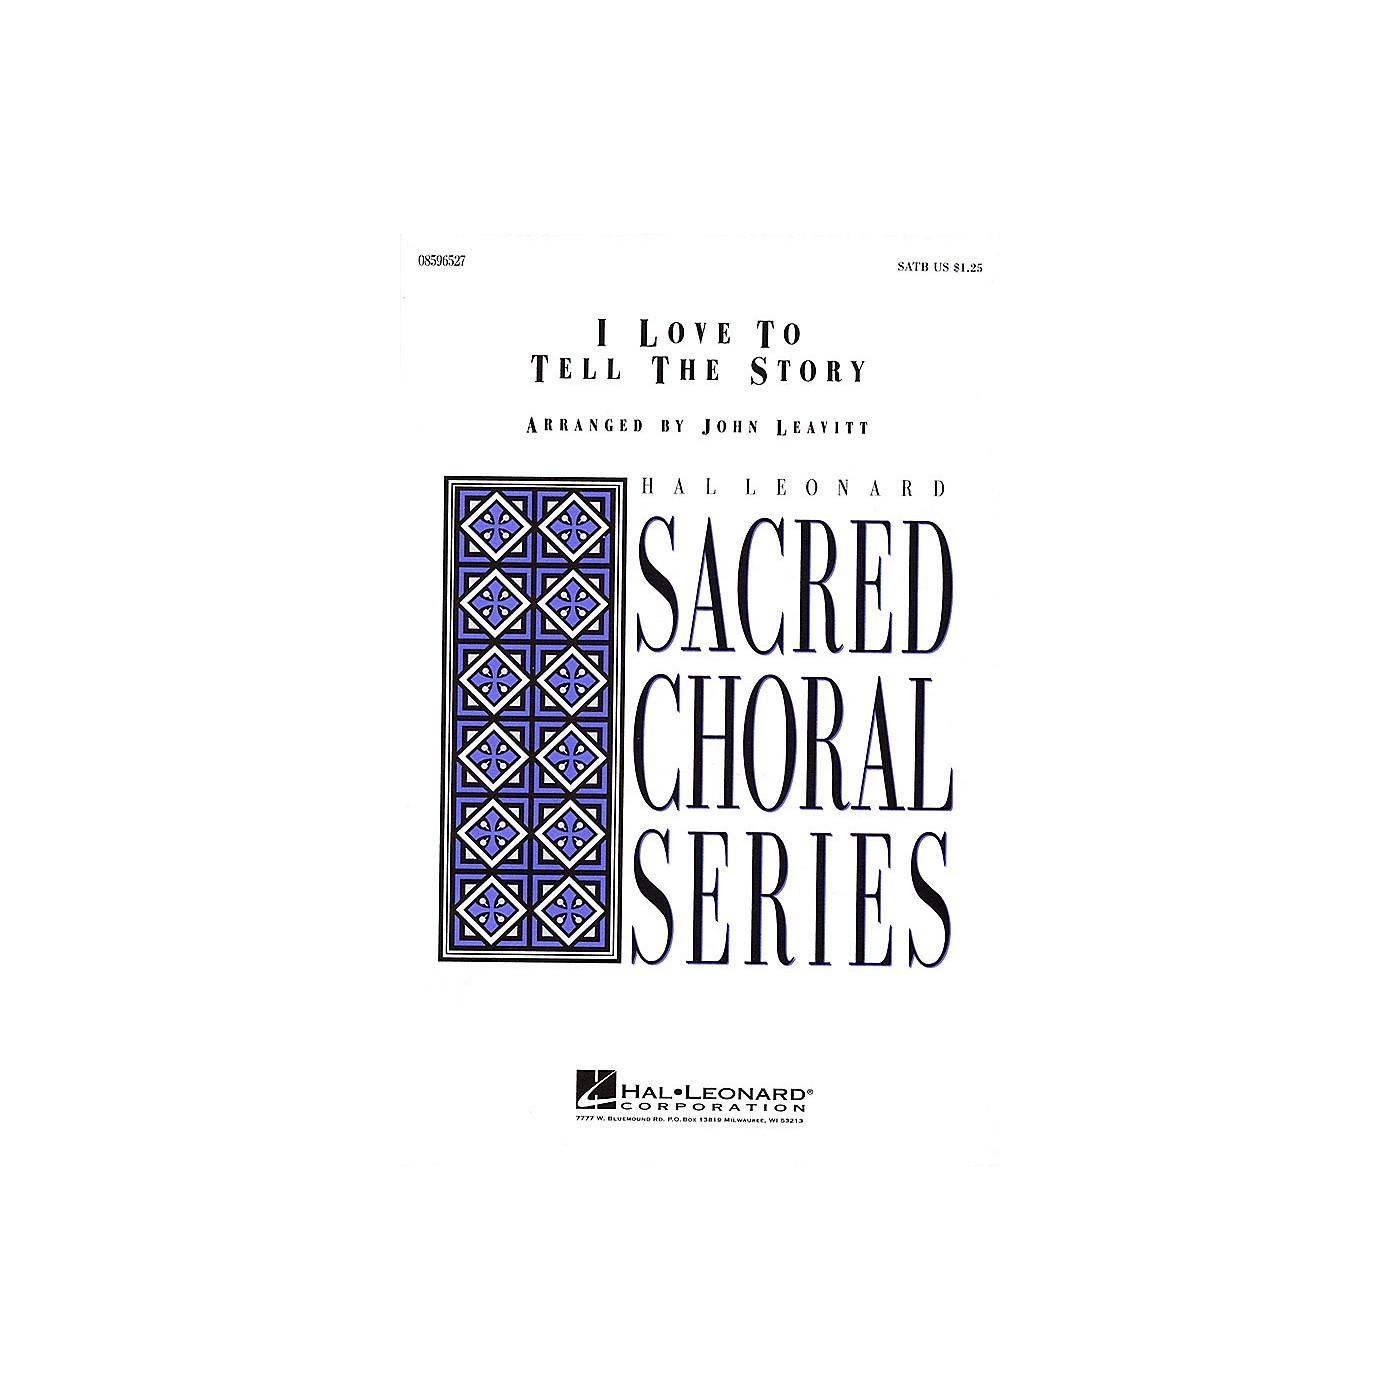 Hal Leonard I Love to Tell the Story SATB arranged by John Leavitt thumbnail